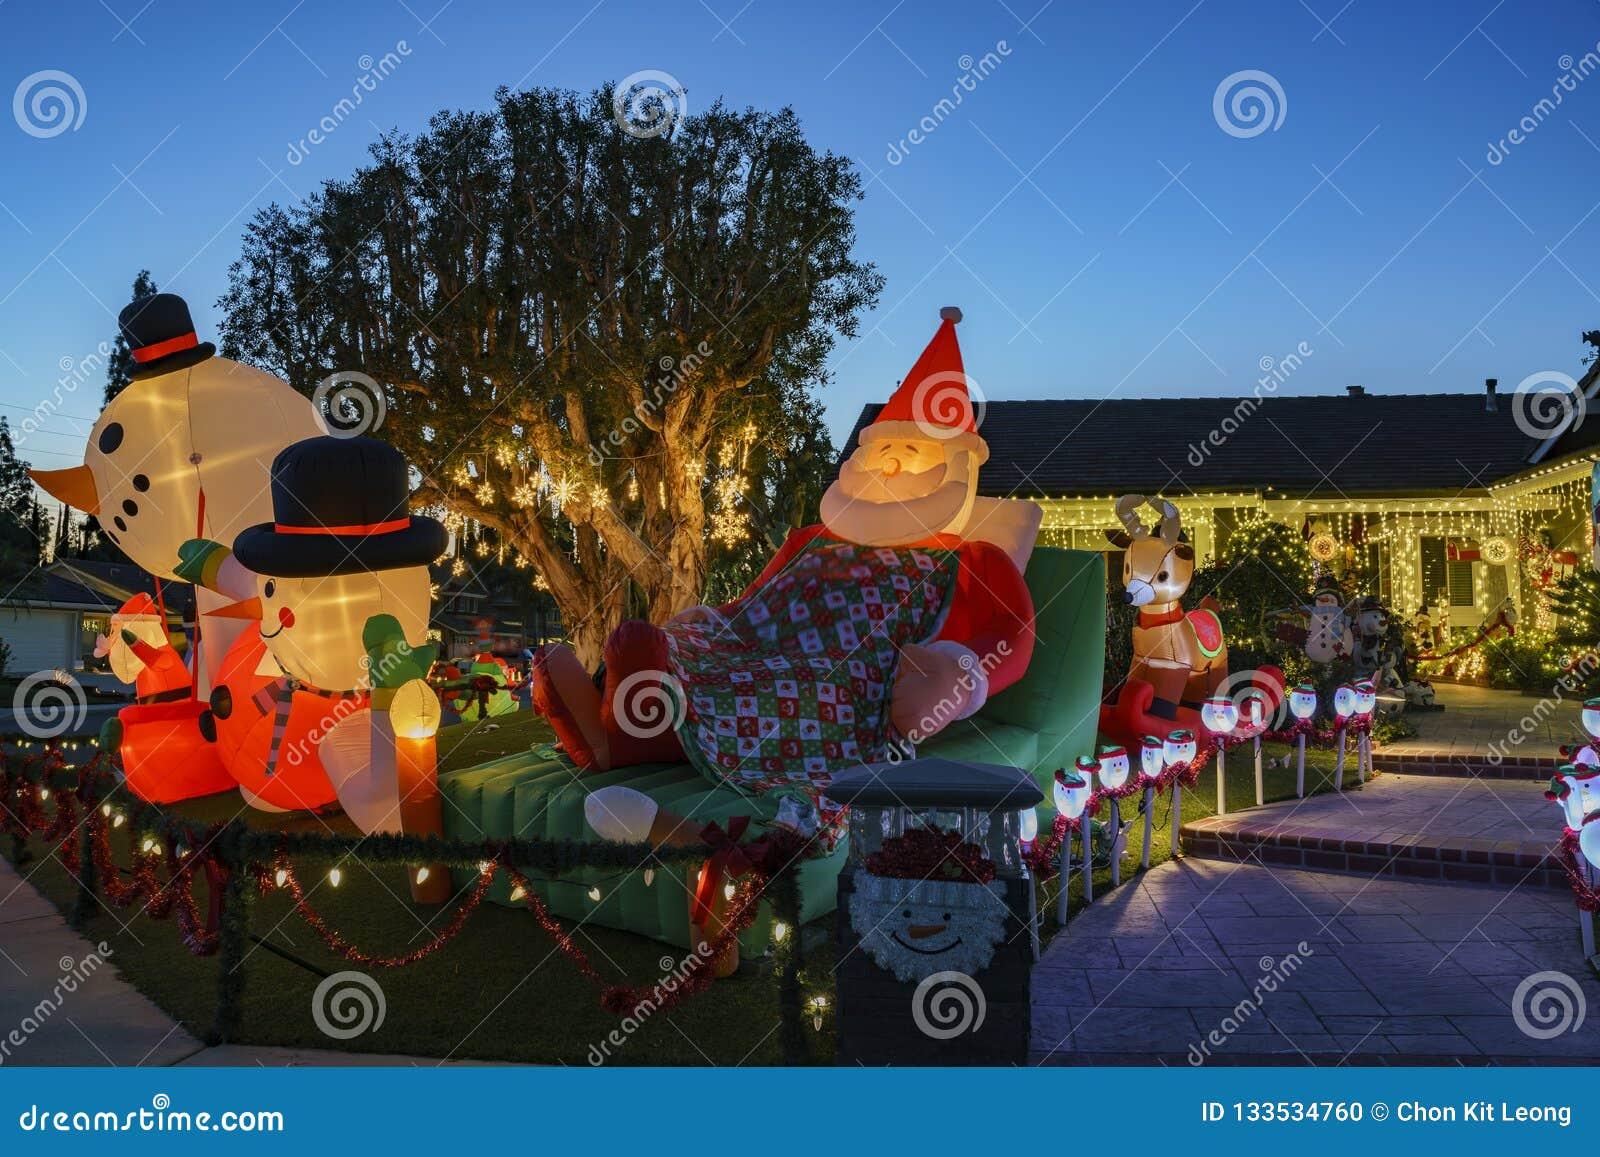 Brea Christmas Lights.Beautiful Christmas Decoration At Brea Neighborhood Stock